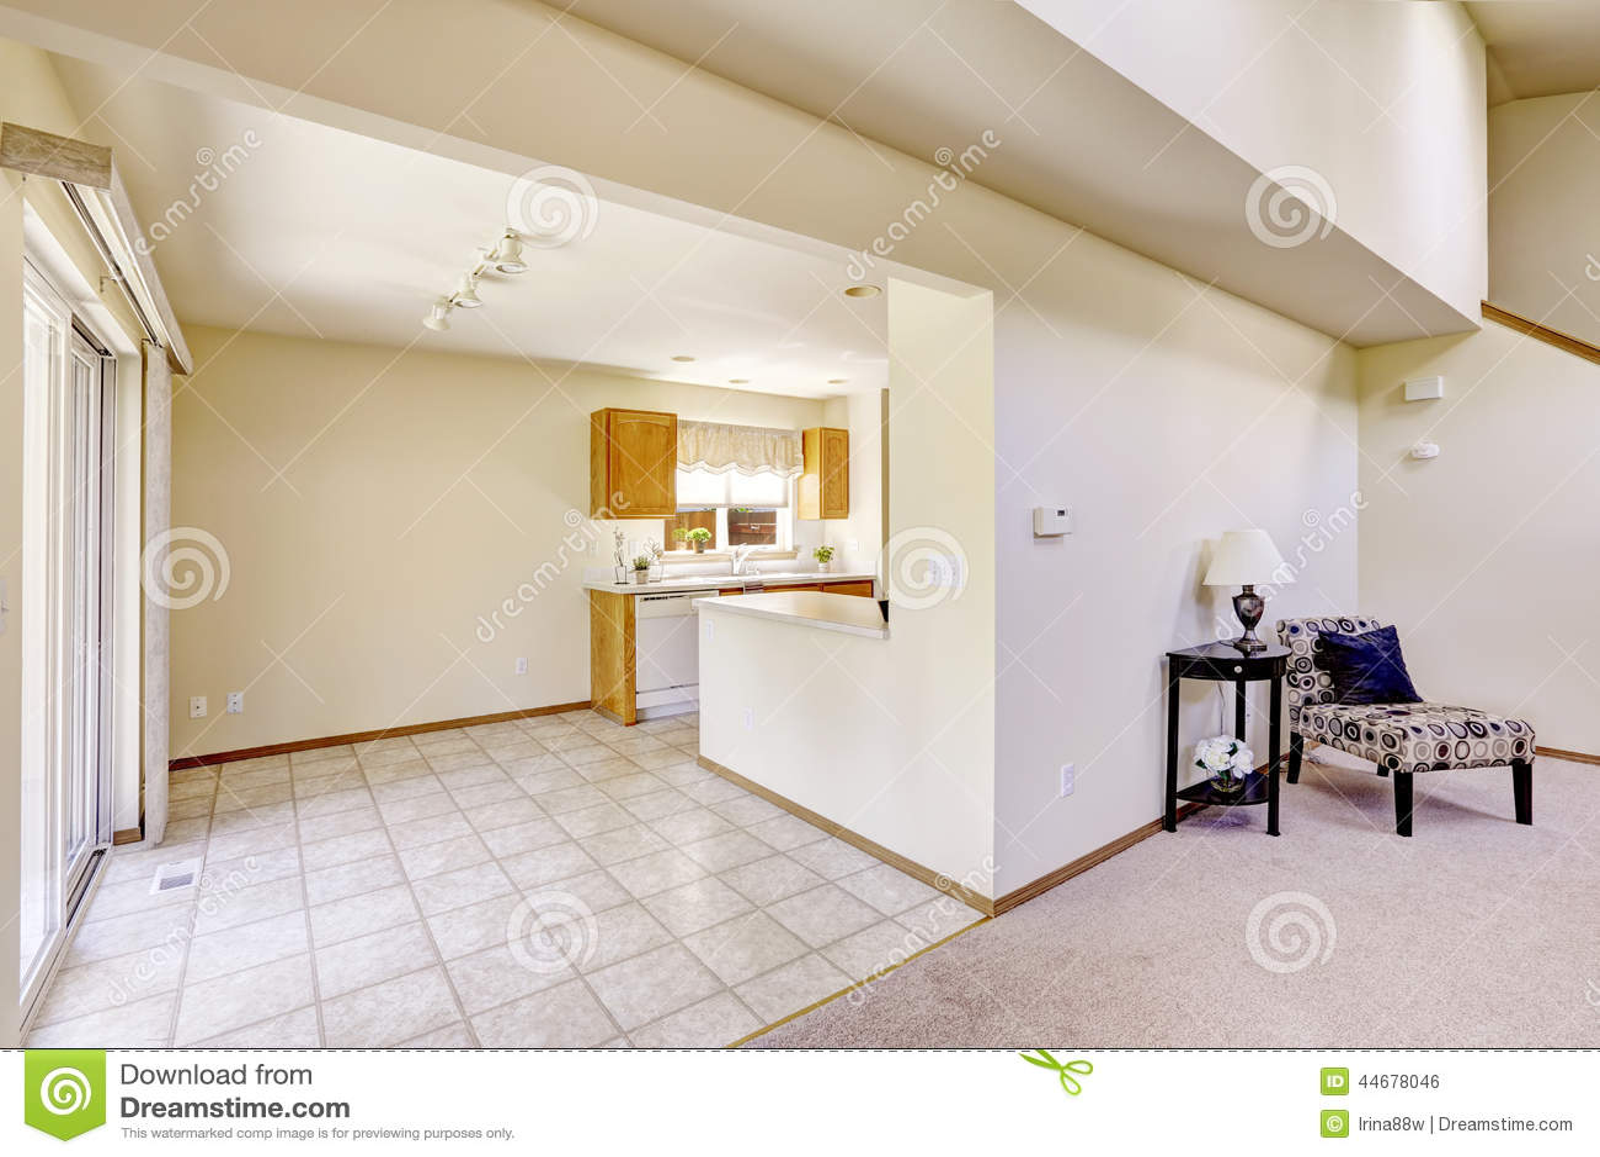 area rugs for kitchen with apron sink 明亮的房间在空的房子里 与砖地的厨房地区 库存照片. 图片 包括有 建筑, 改造, 内部, 住宅, 地毯 ...